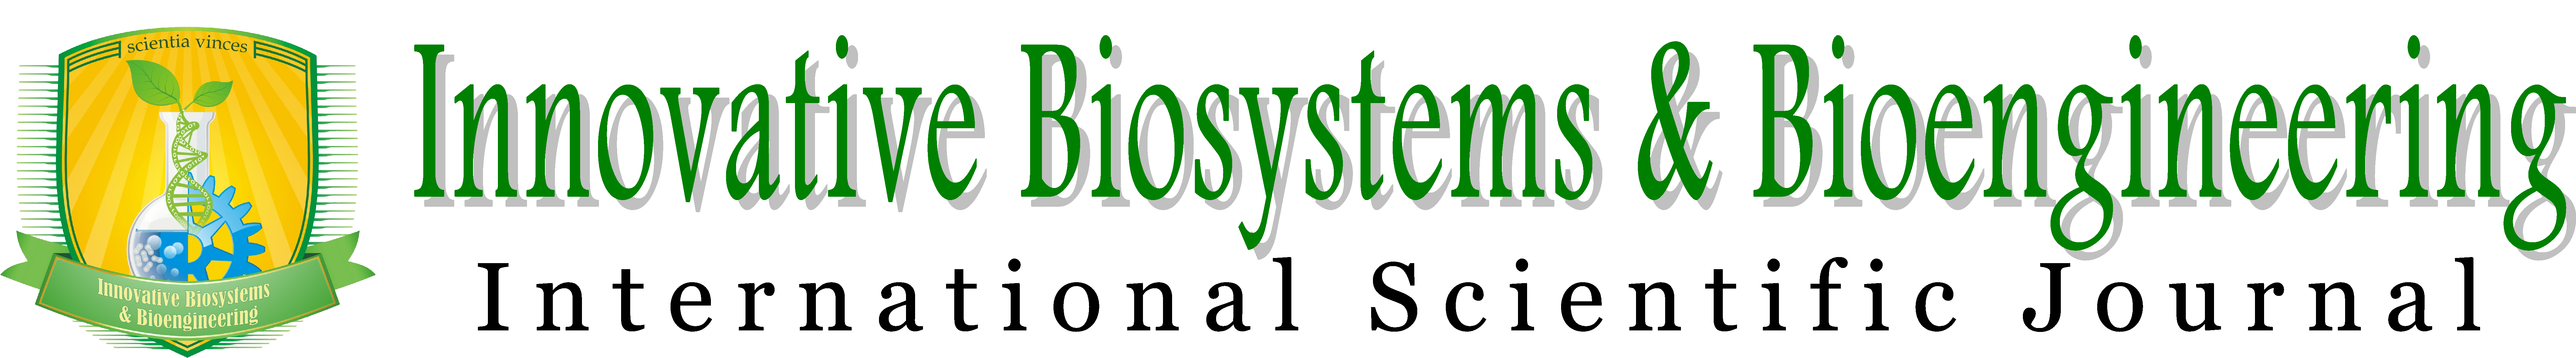 Innovative Biosystems and Bioengineering